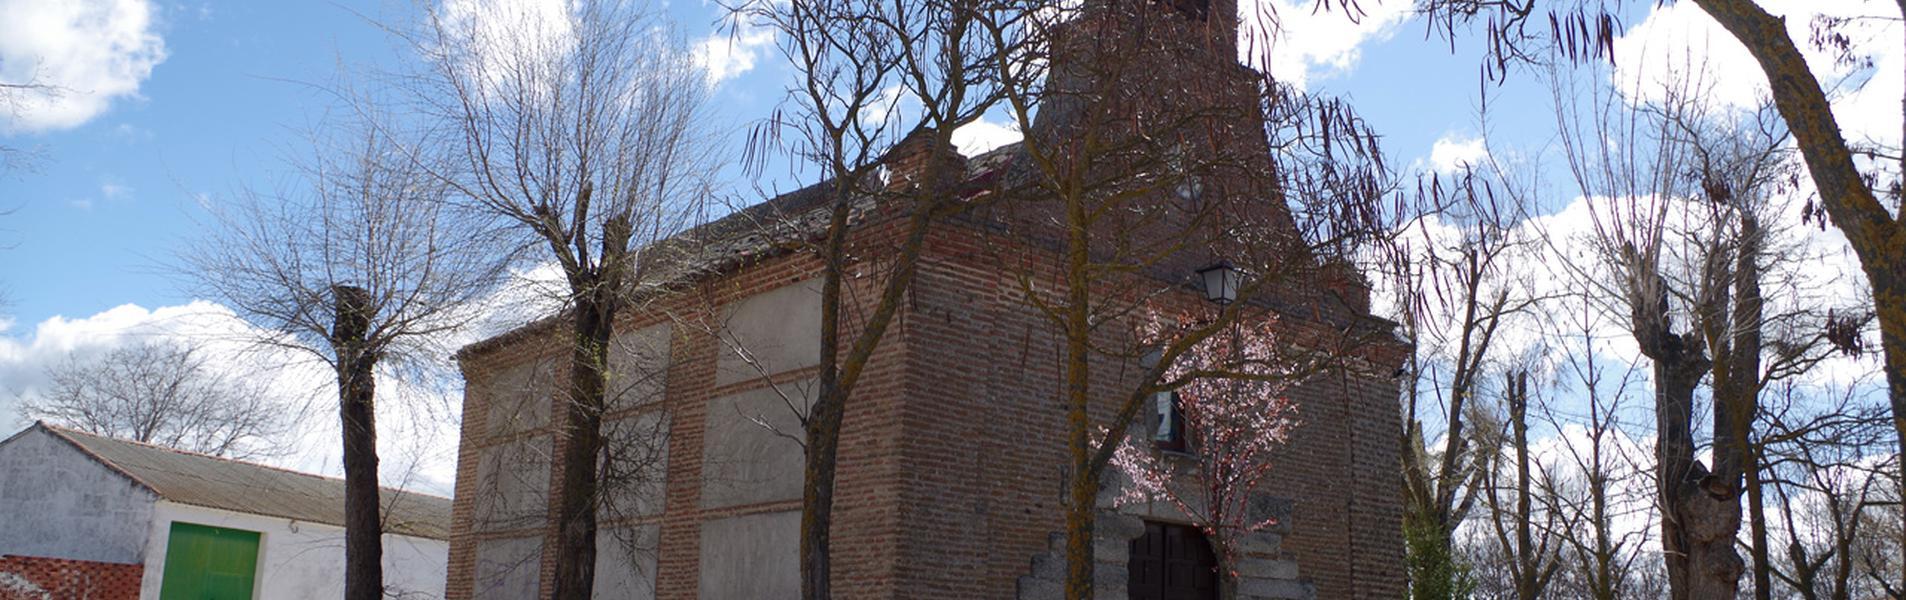 Palacios de Goda